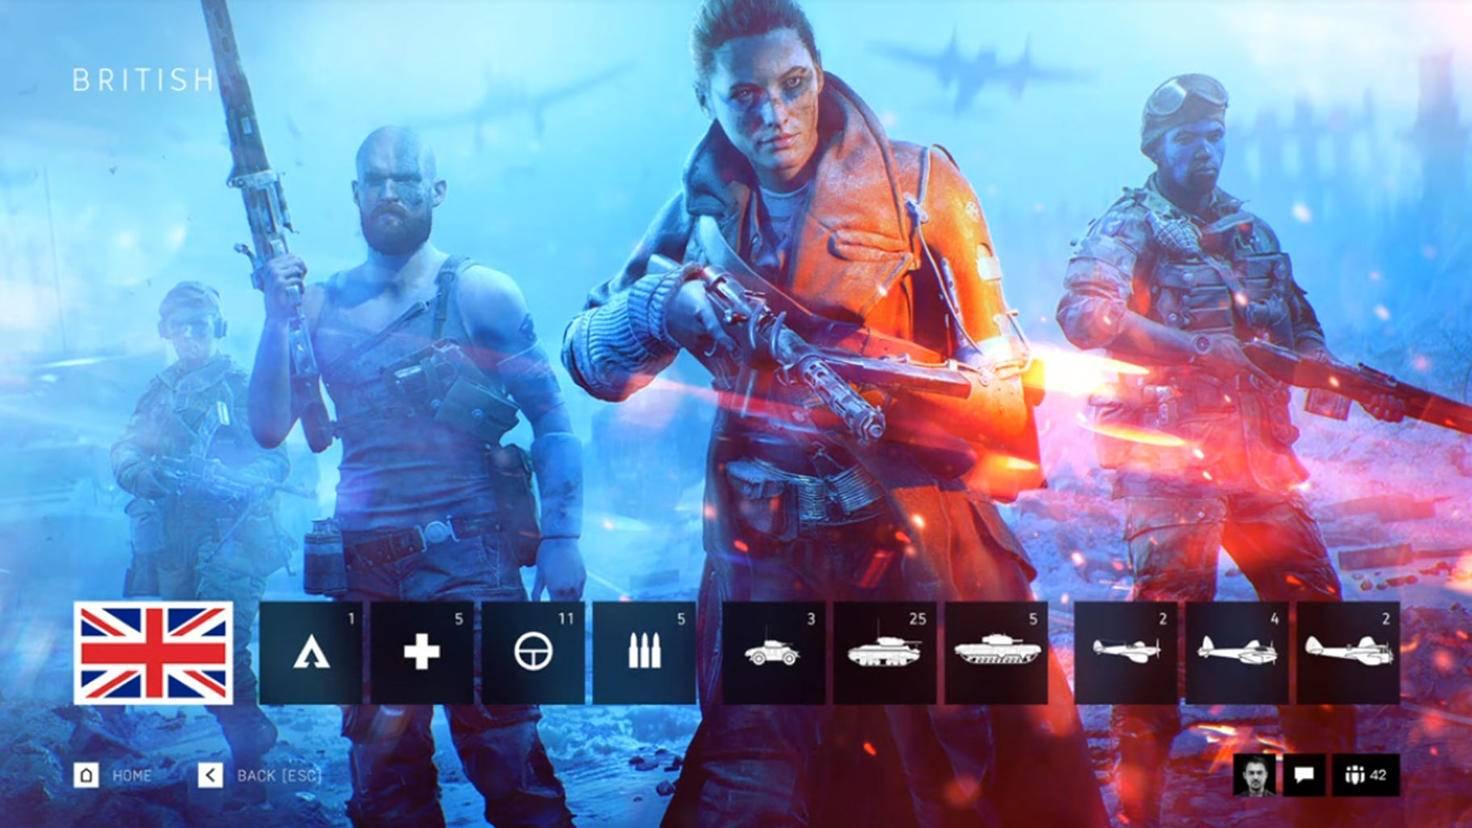 battlefield-5-reveal-event-company-screenshot